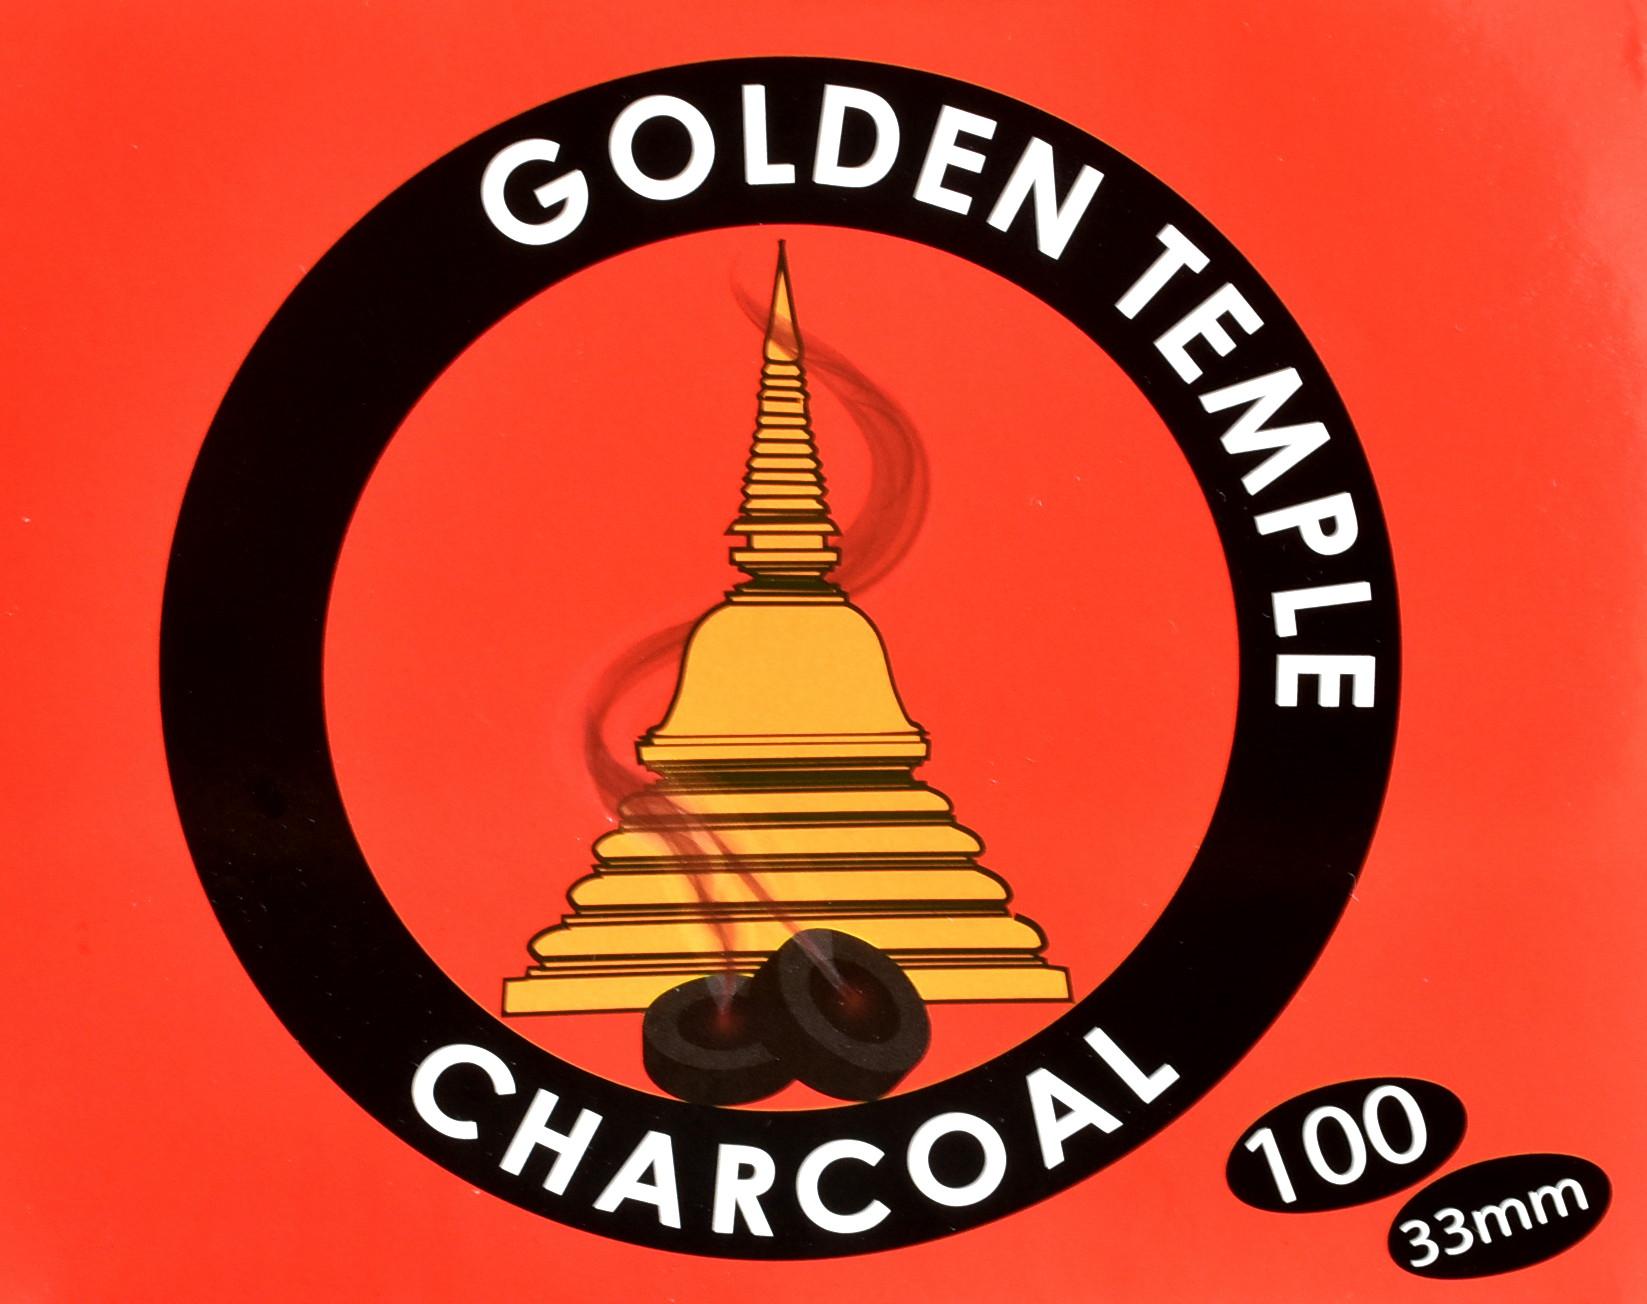 Räucherzange golden